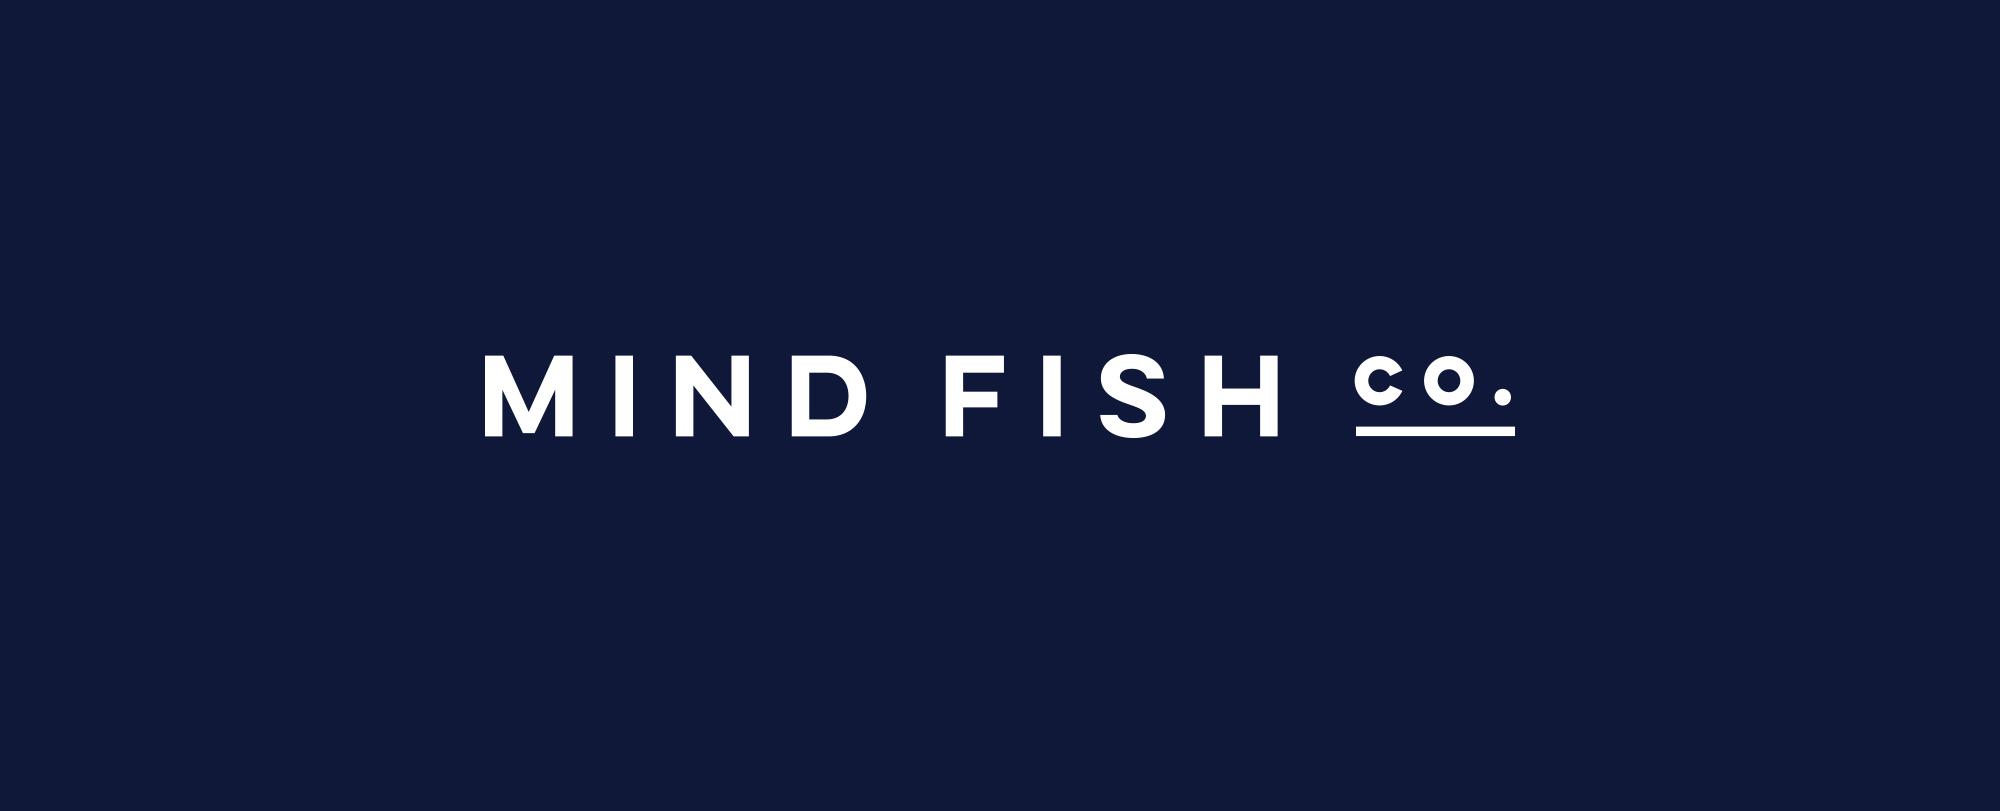 6_Tsz_MindFish.jpg